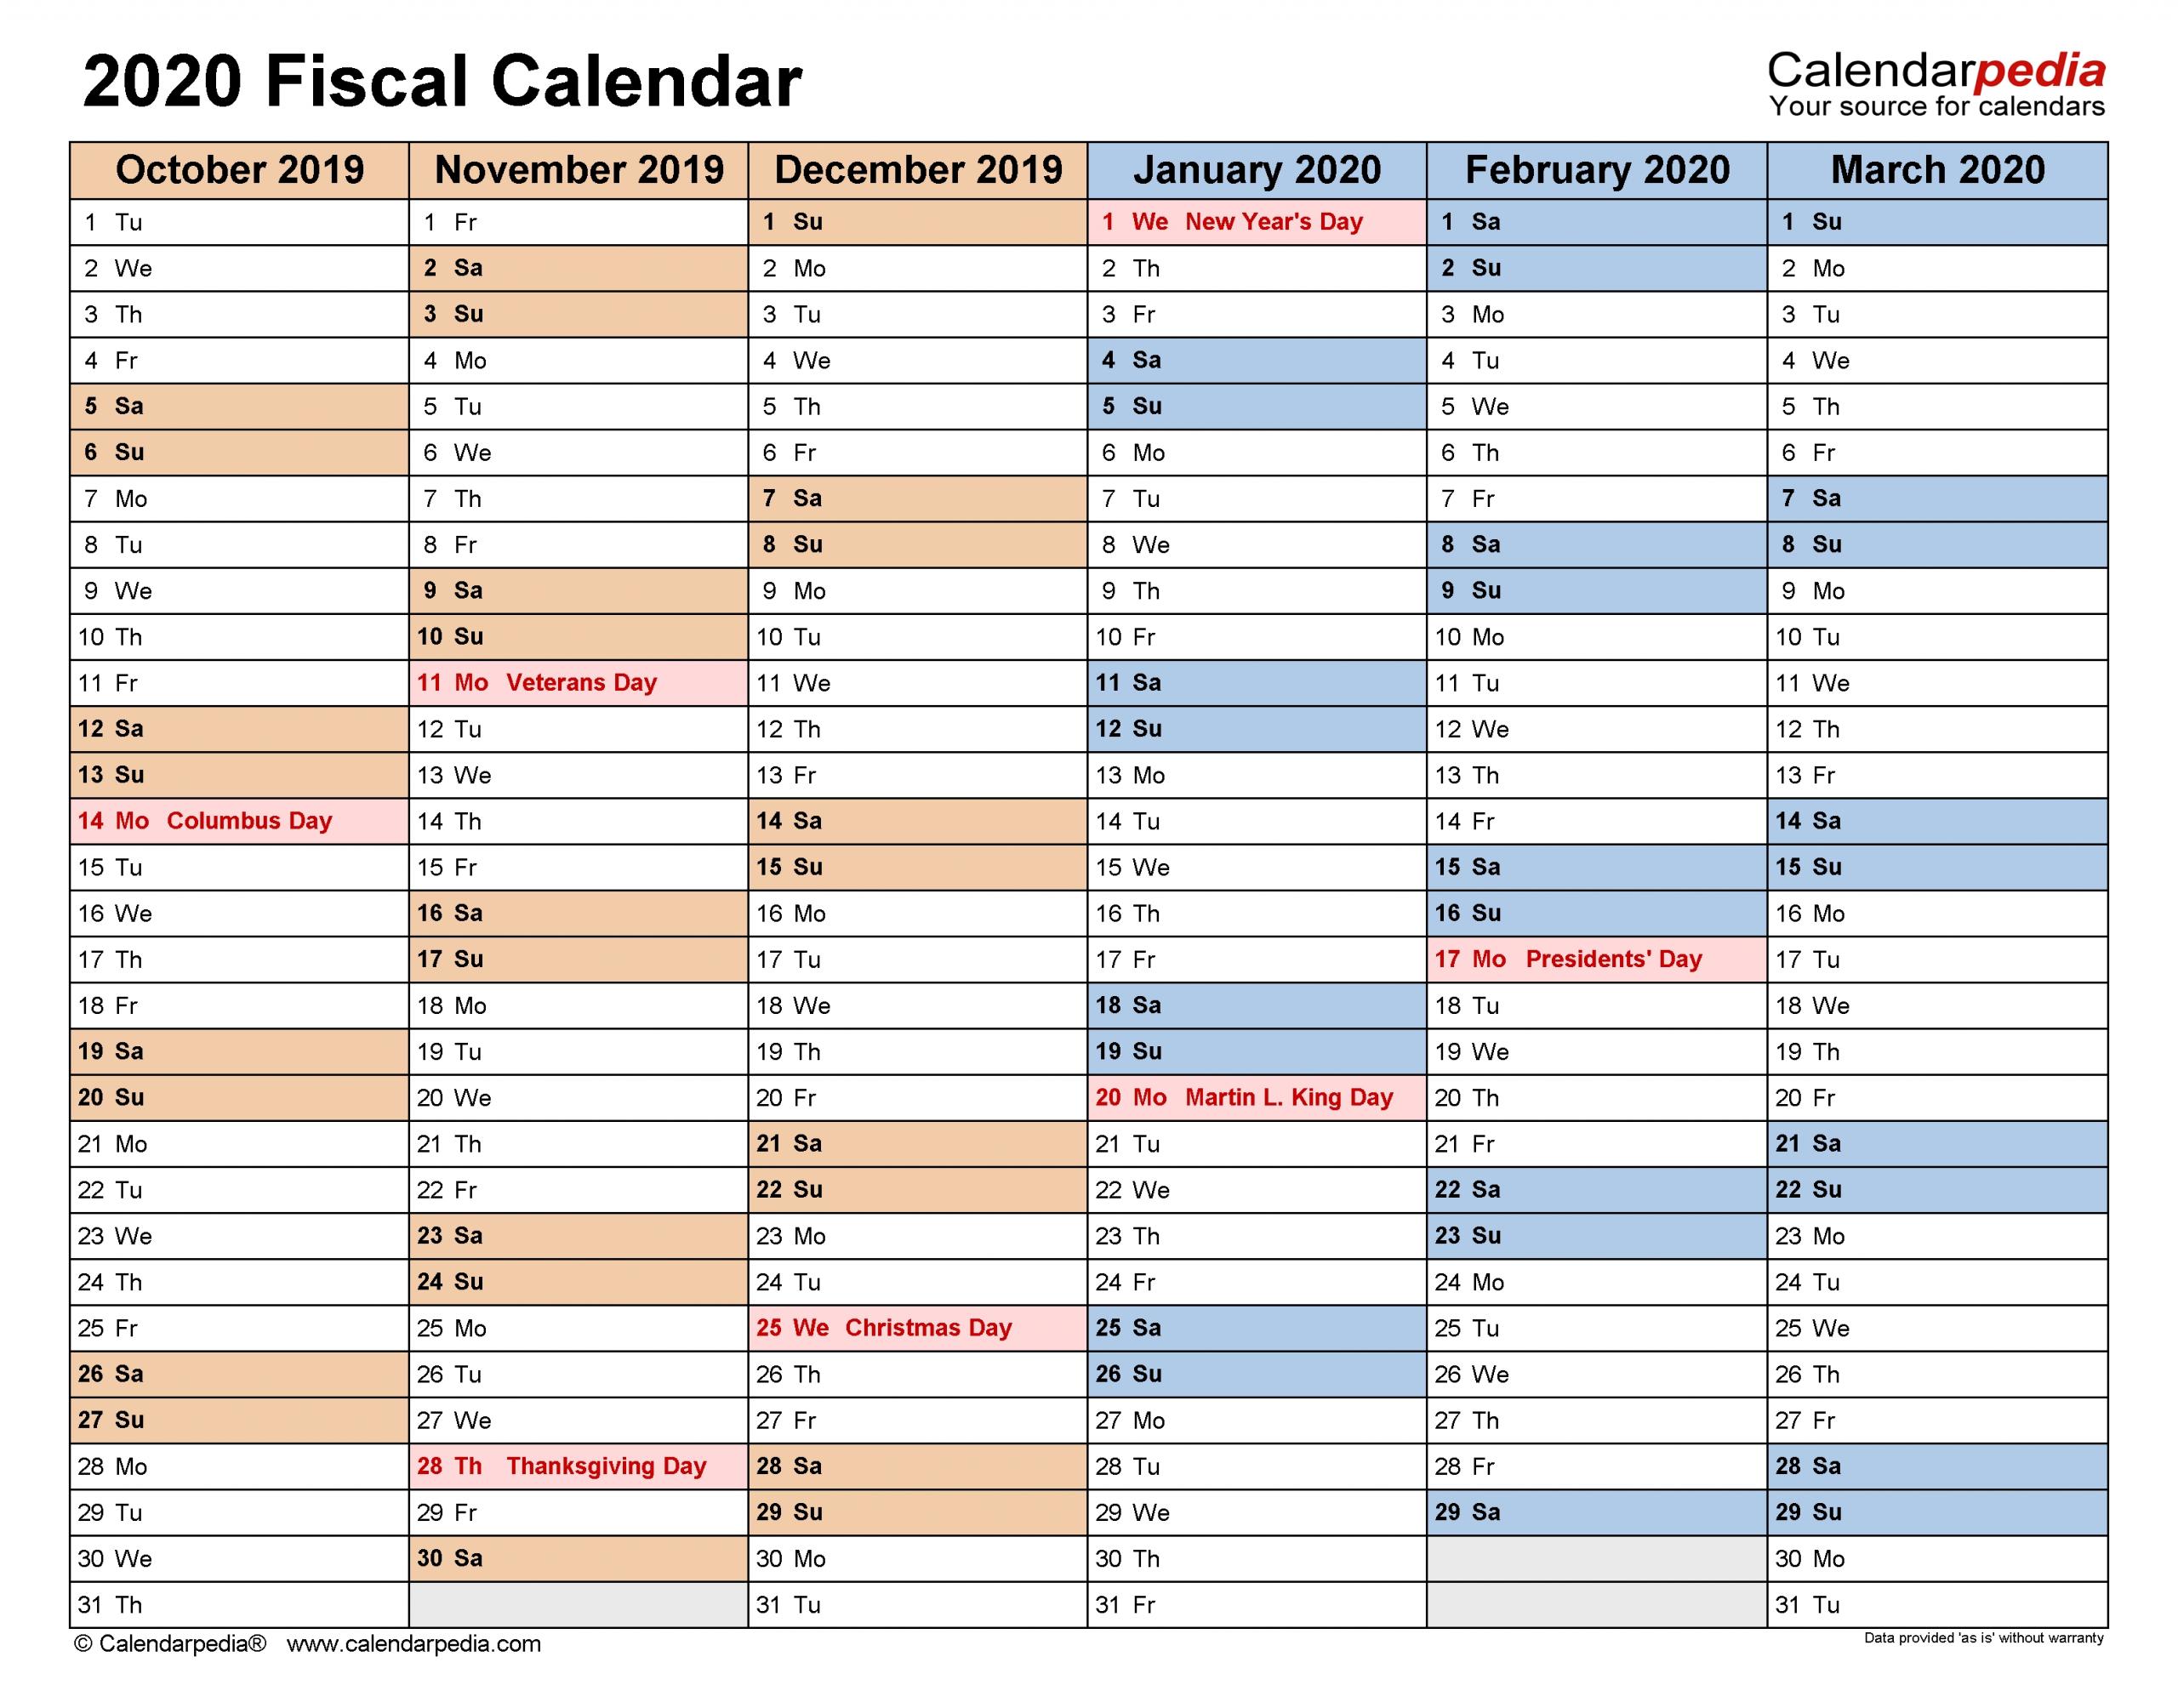 Fiscal Calendars 2020 - Free Printable Pdf Templates inside Financial Calendar 2019-2020 In Weeks